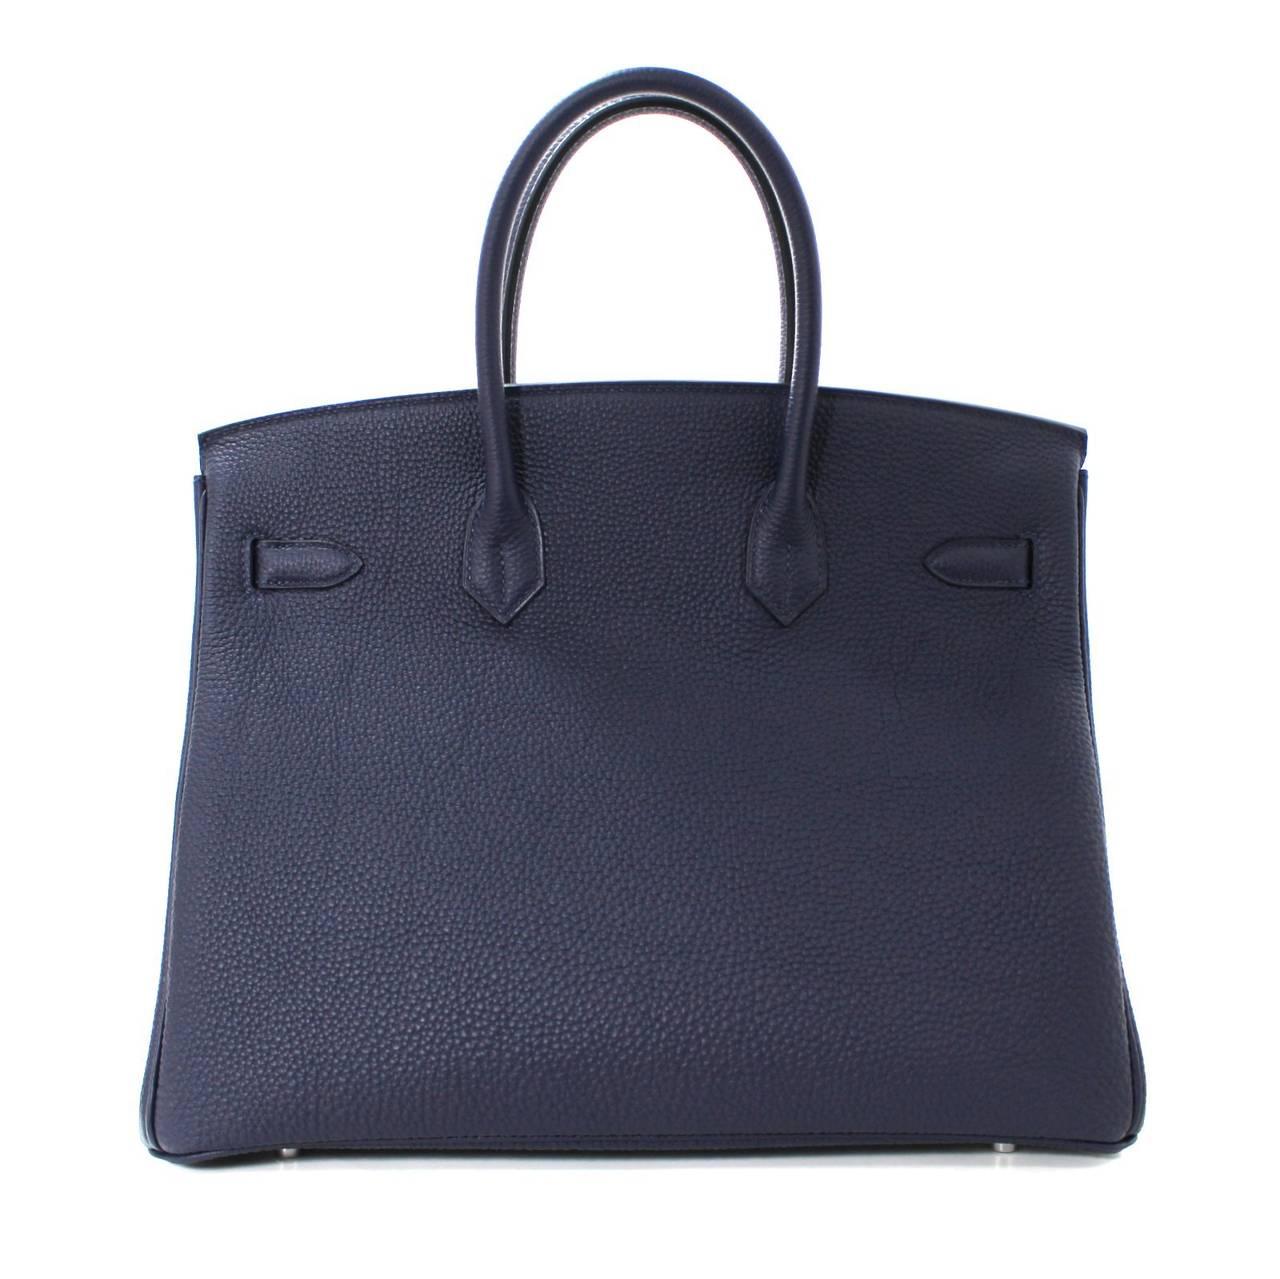 Hermes 35 cm Navy Blue Nuit Togo Leather Birkin with Palladium 2